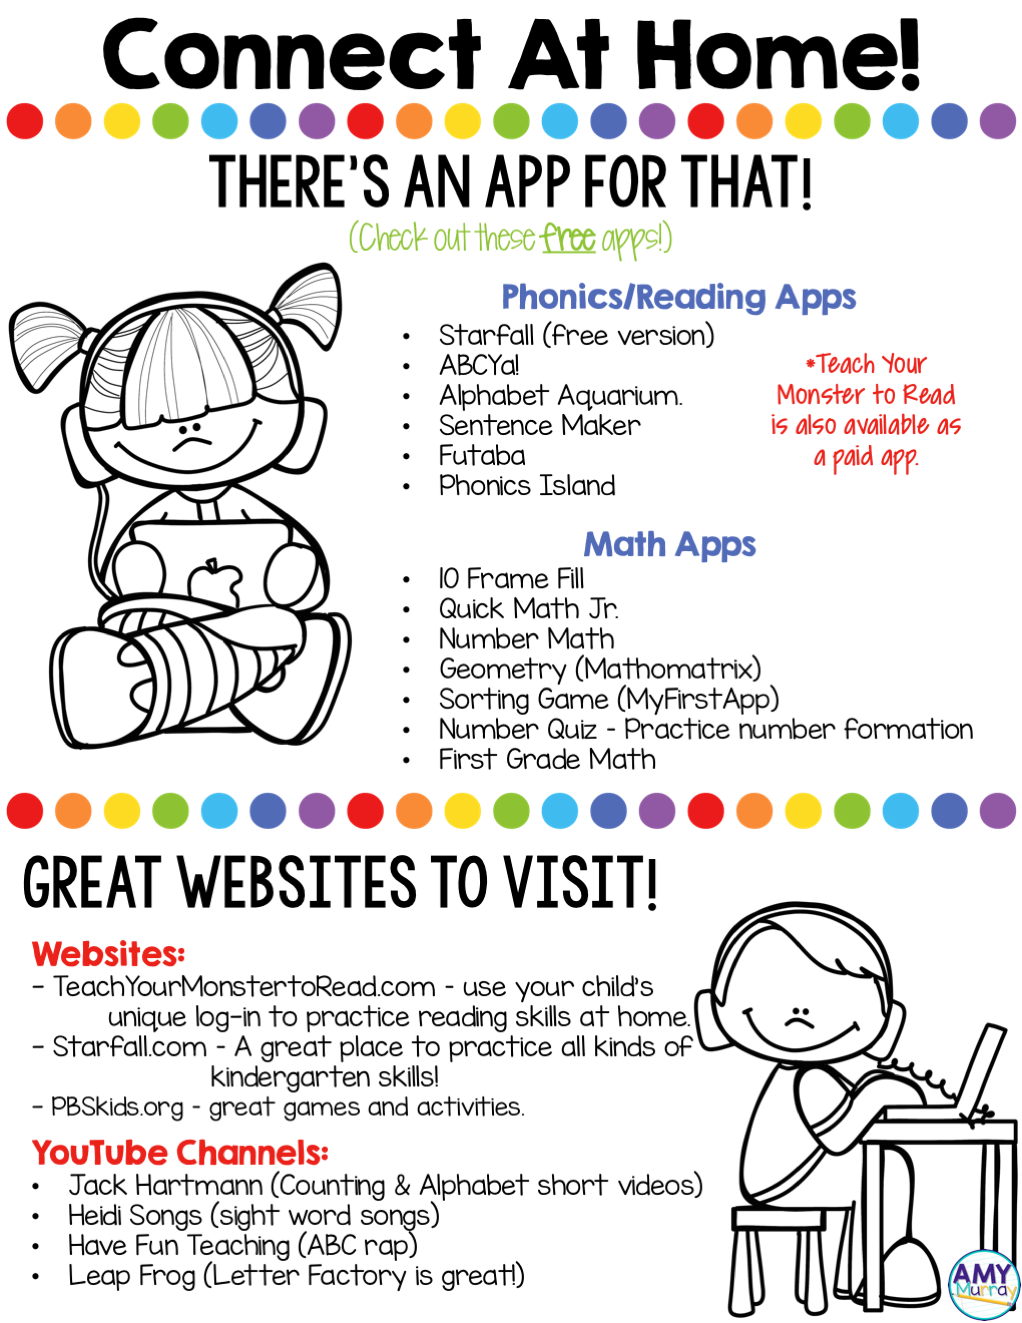 Technology Connection Flyer Editable Template   Parents ...